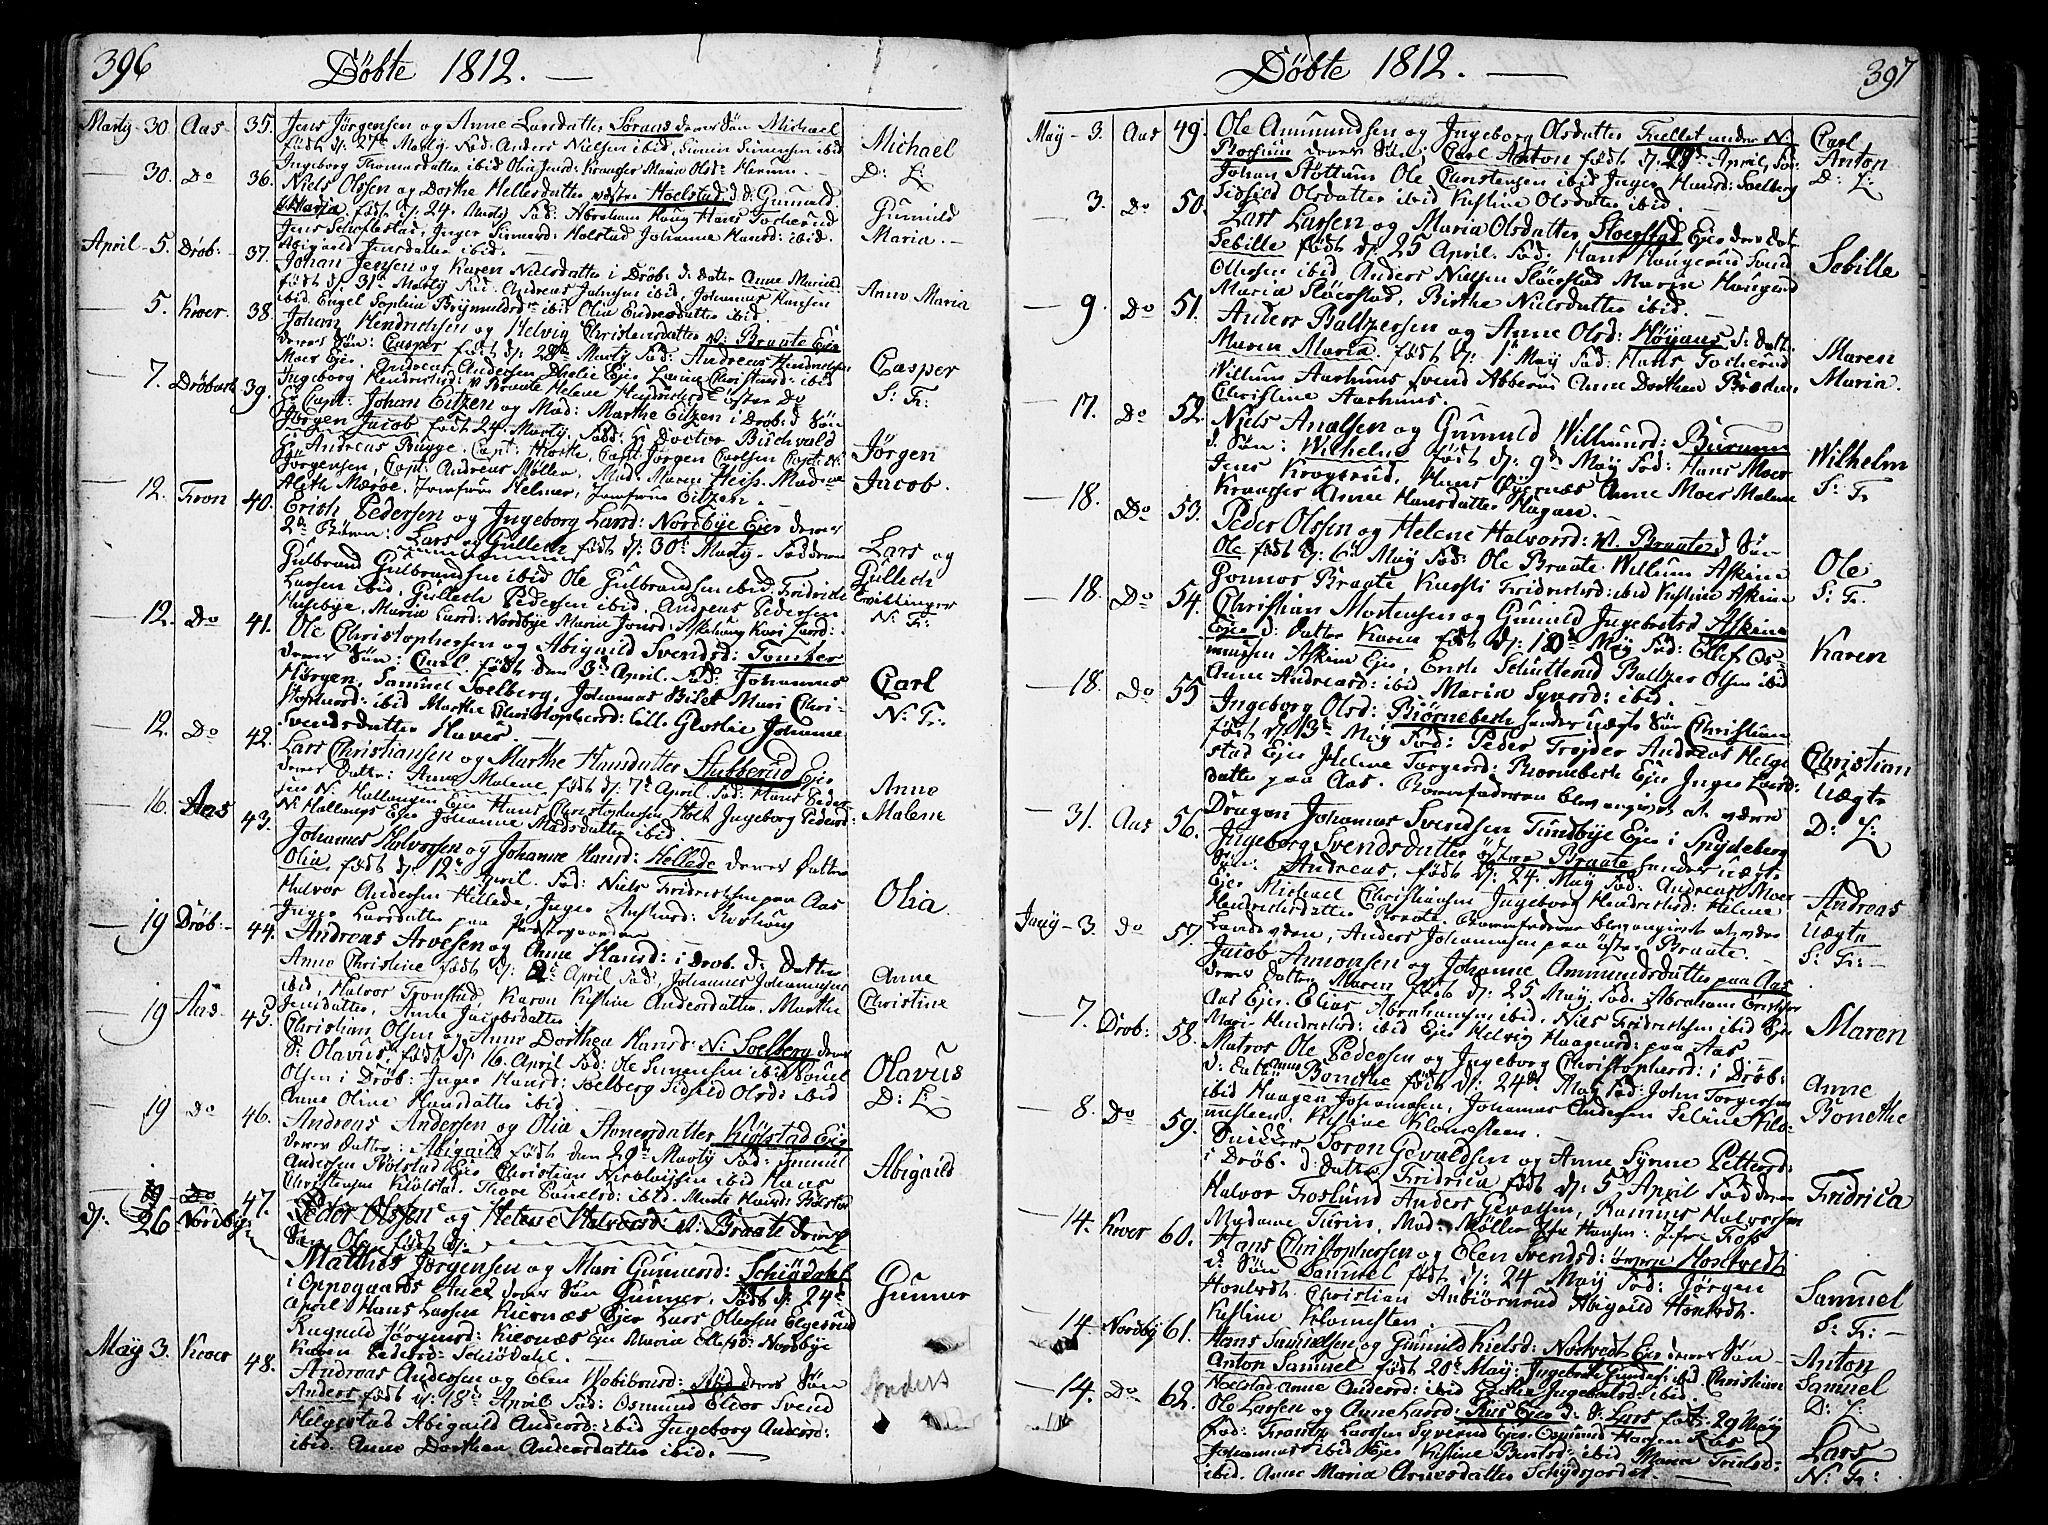 SAO, Ås prestekontor Kirkebøker, F/Fa/L0002: Ministerialbok nr. I 2, 1778-1813, s. 396-397